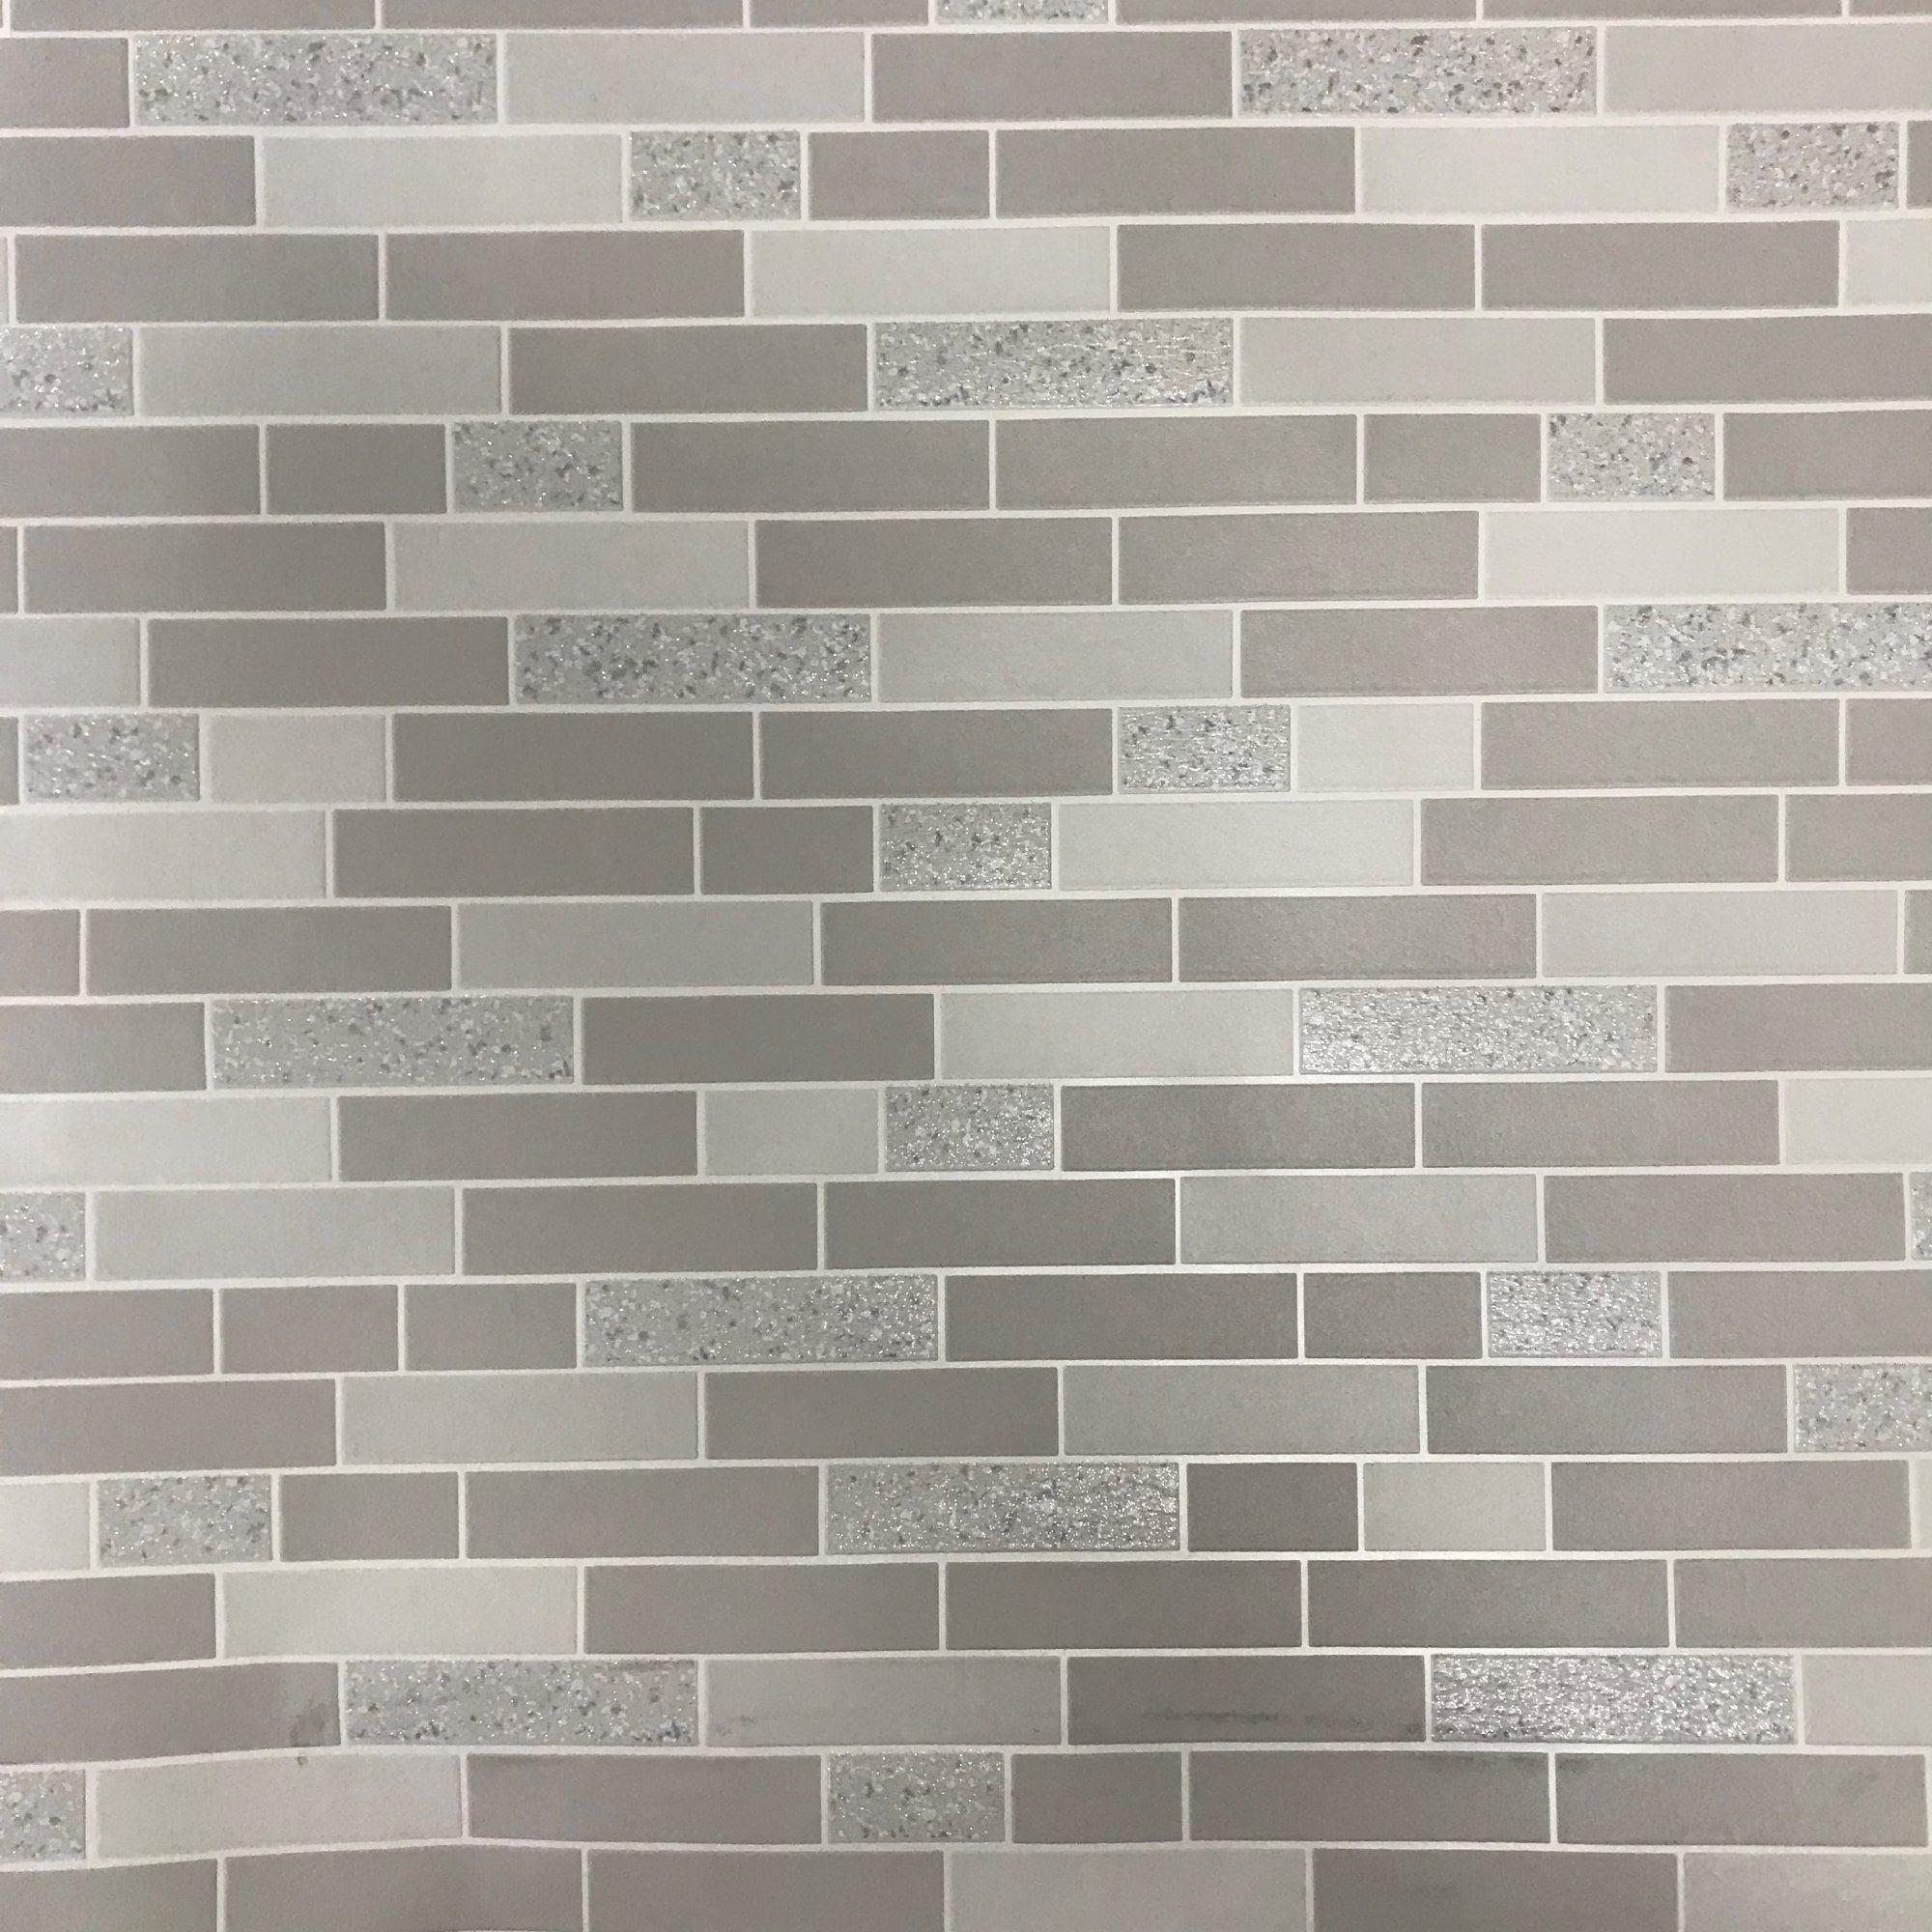 Holden Decor Black Grey Glitter Effect Granite Silver Tile on a Roll Wallpaper